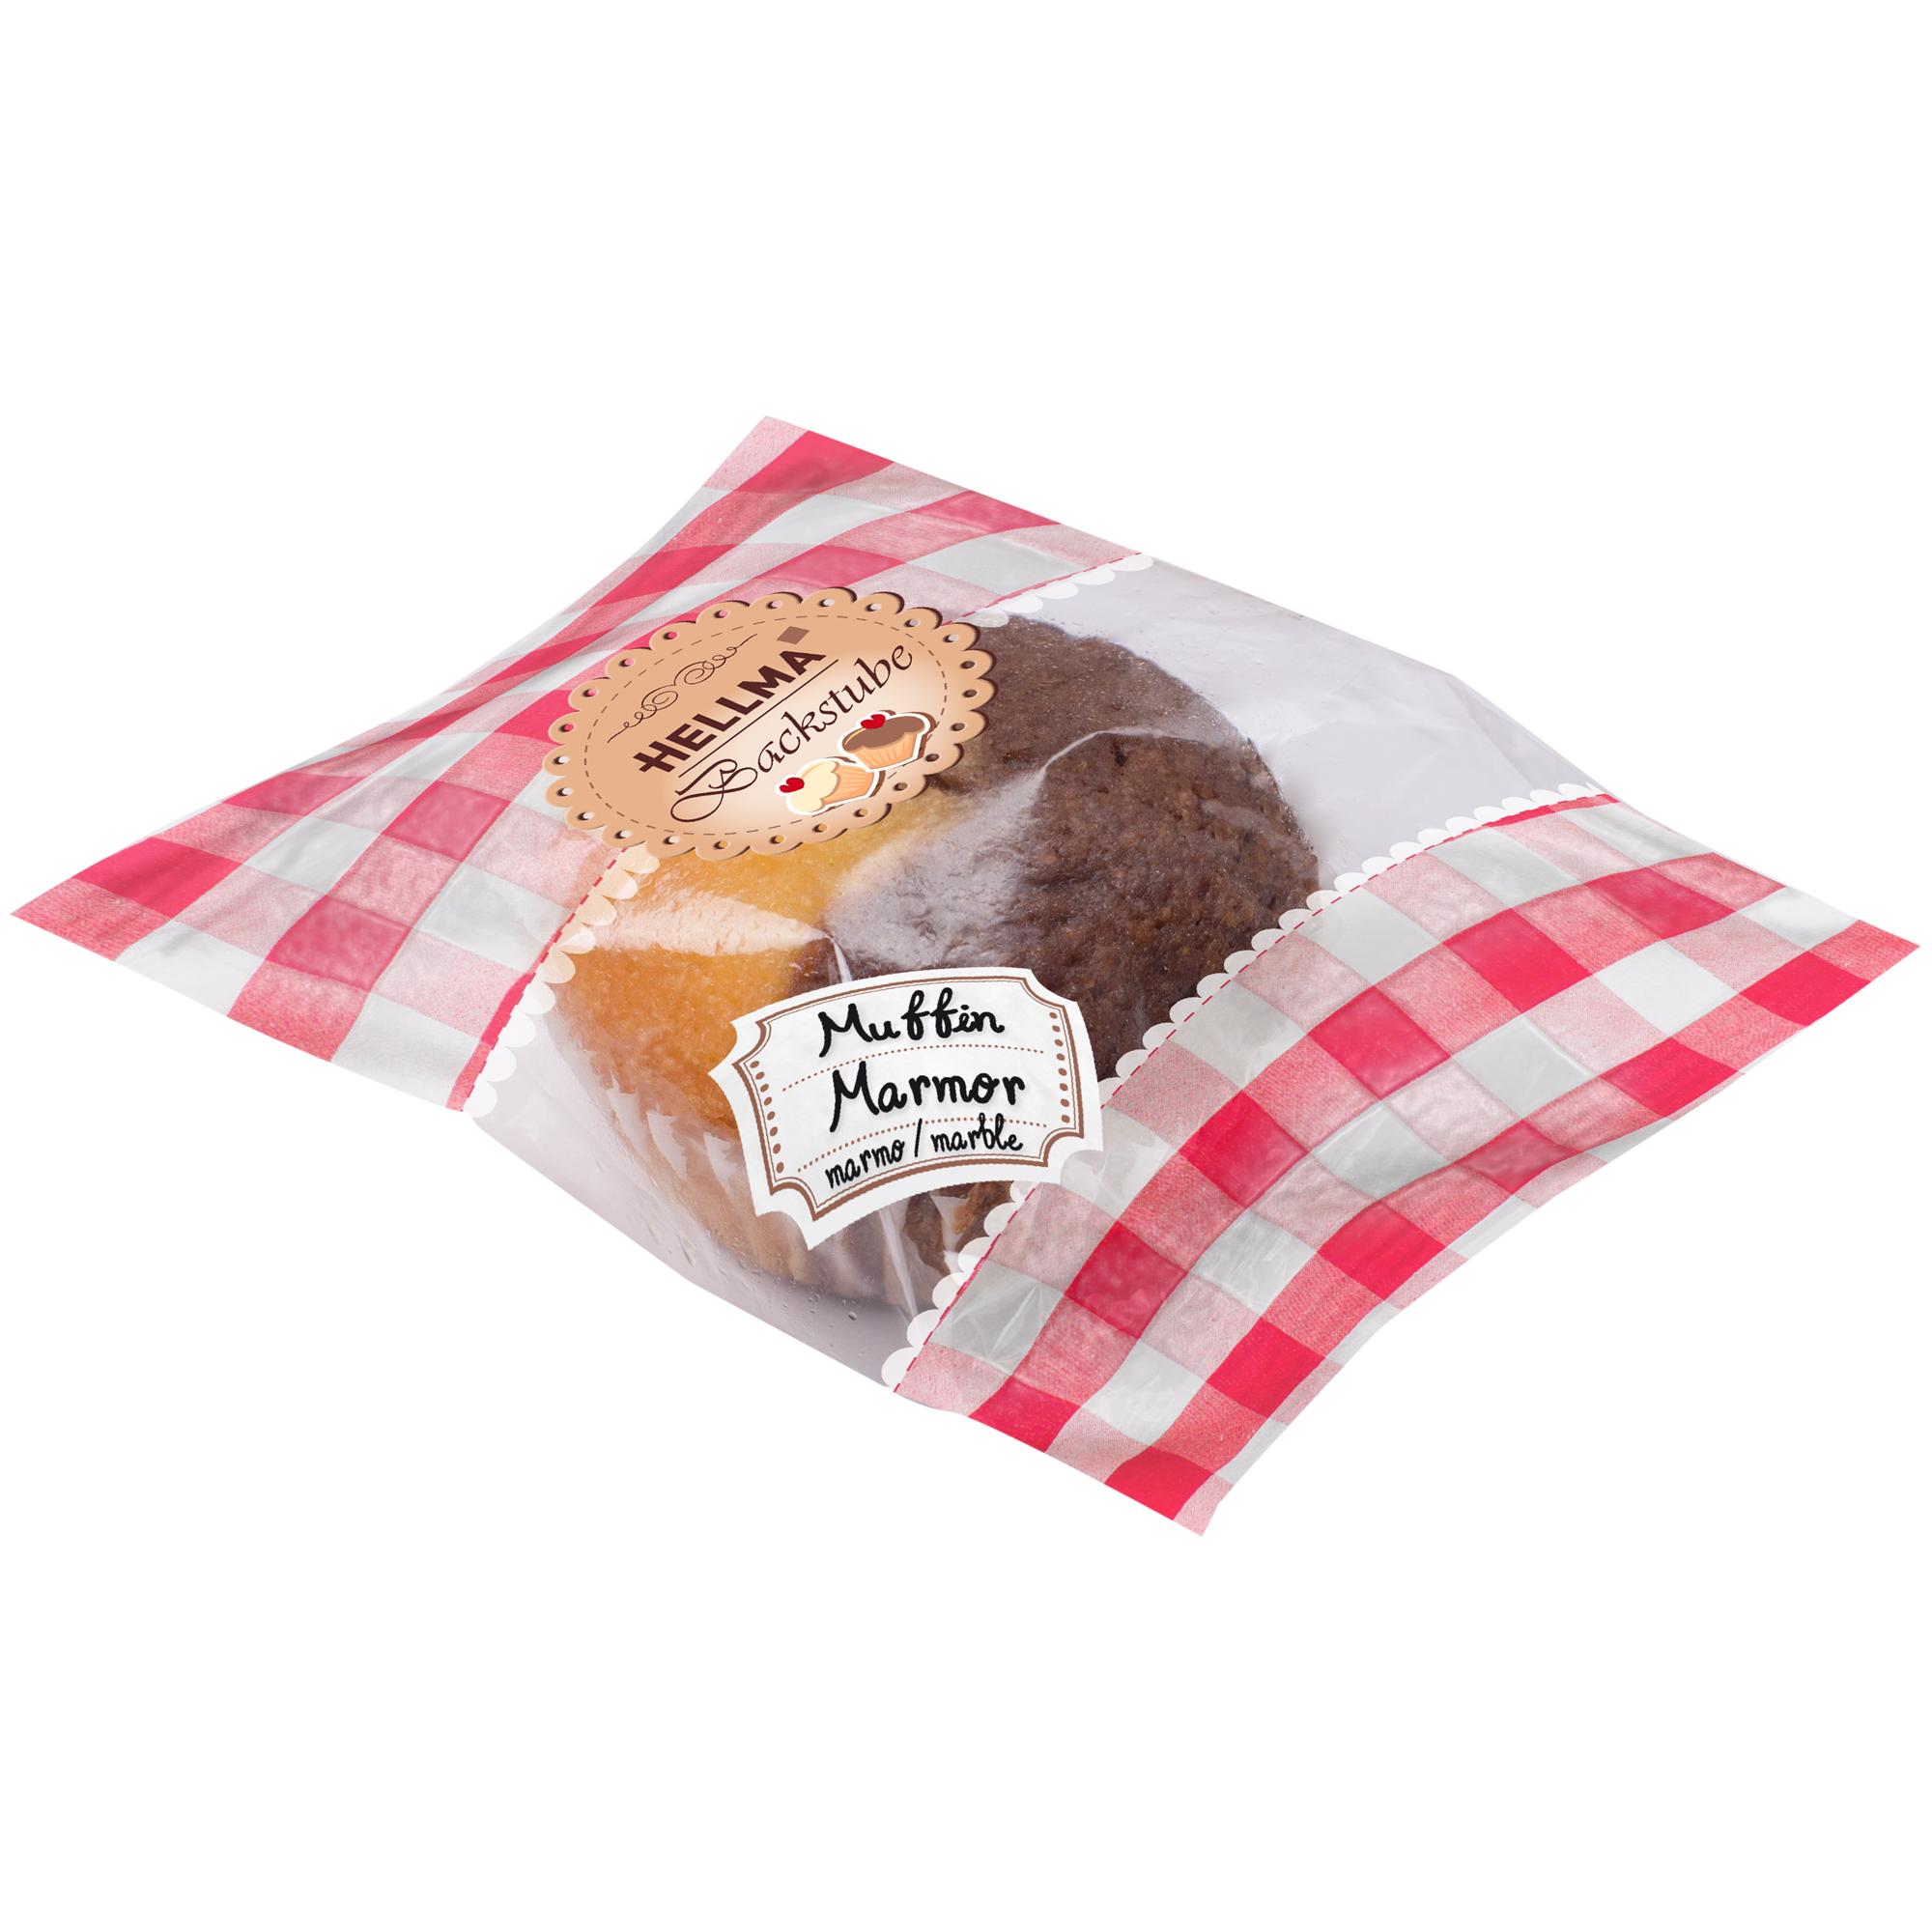 hellma muffin marmor 70er online kaufen im world of sweets shop. Black Bedroom Furniture Sets. Home Design Ideas